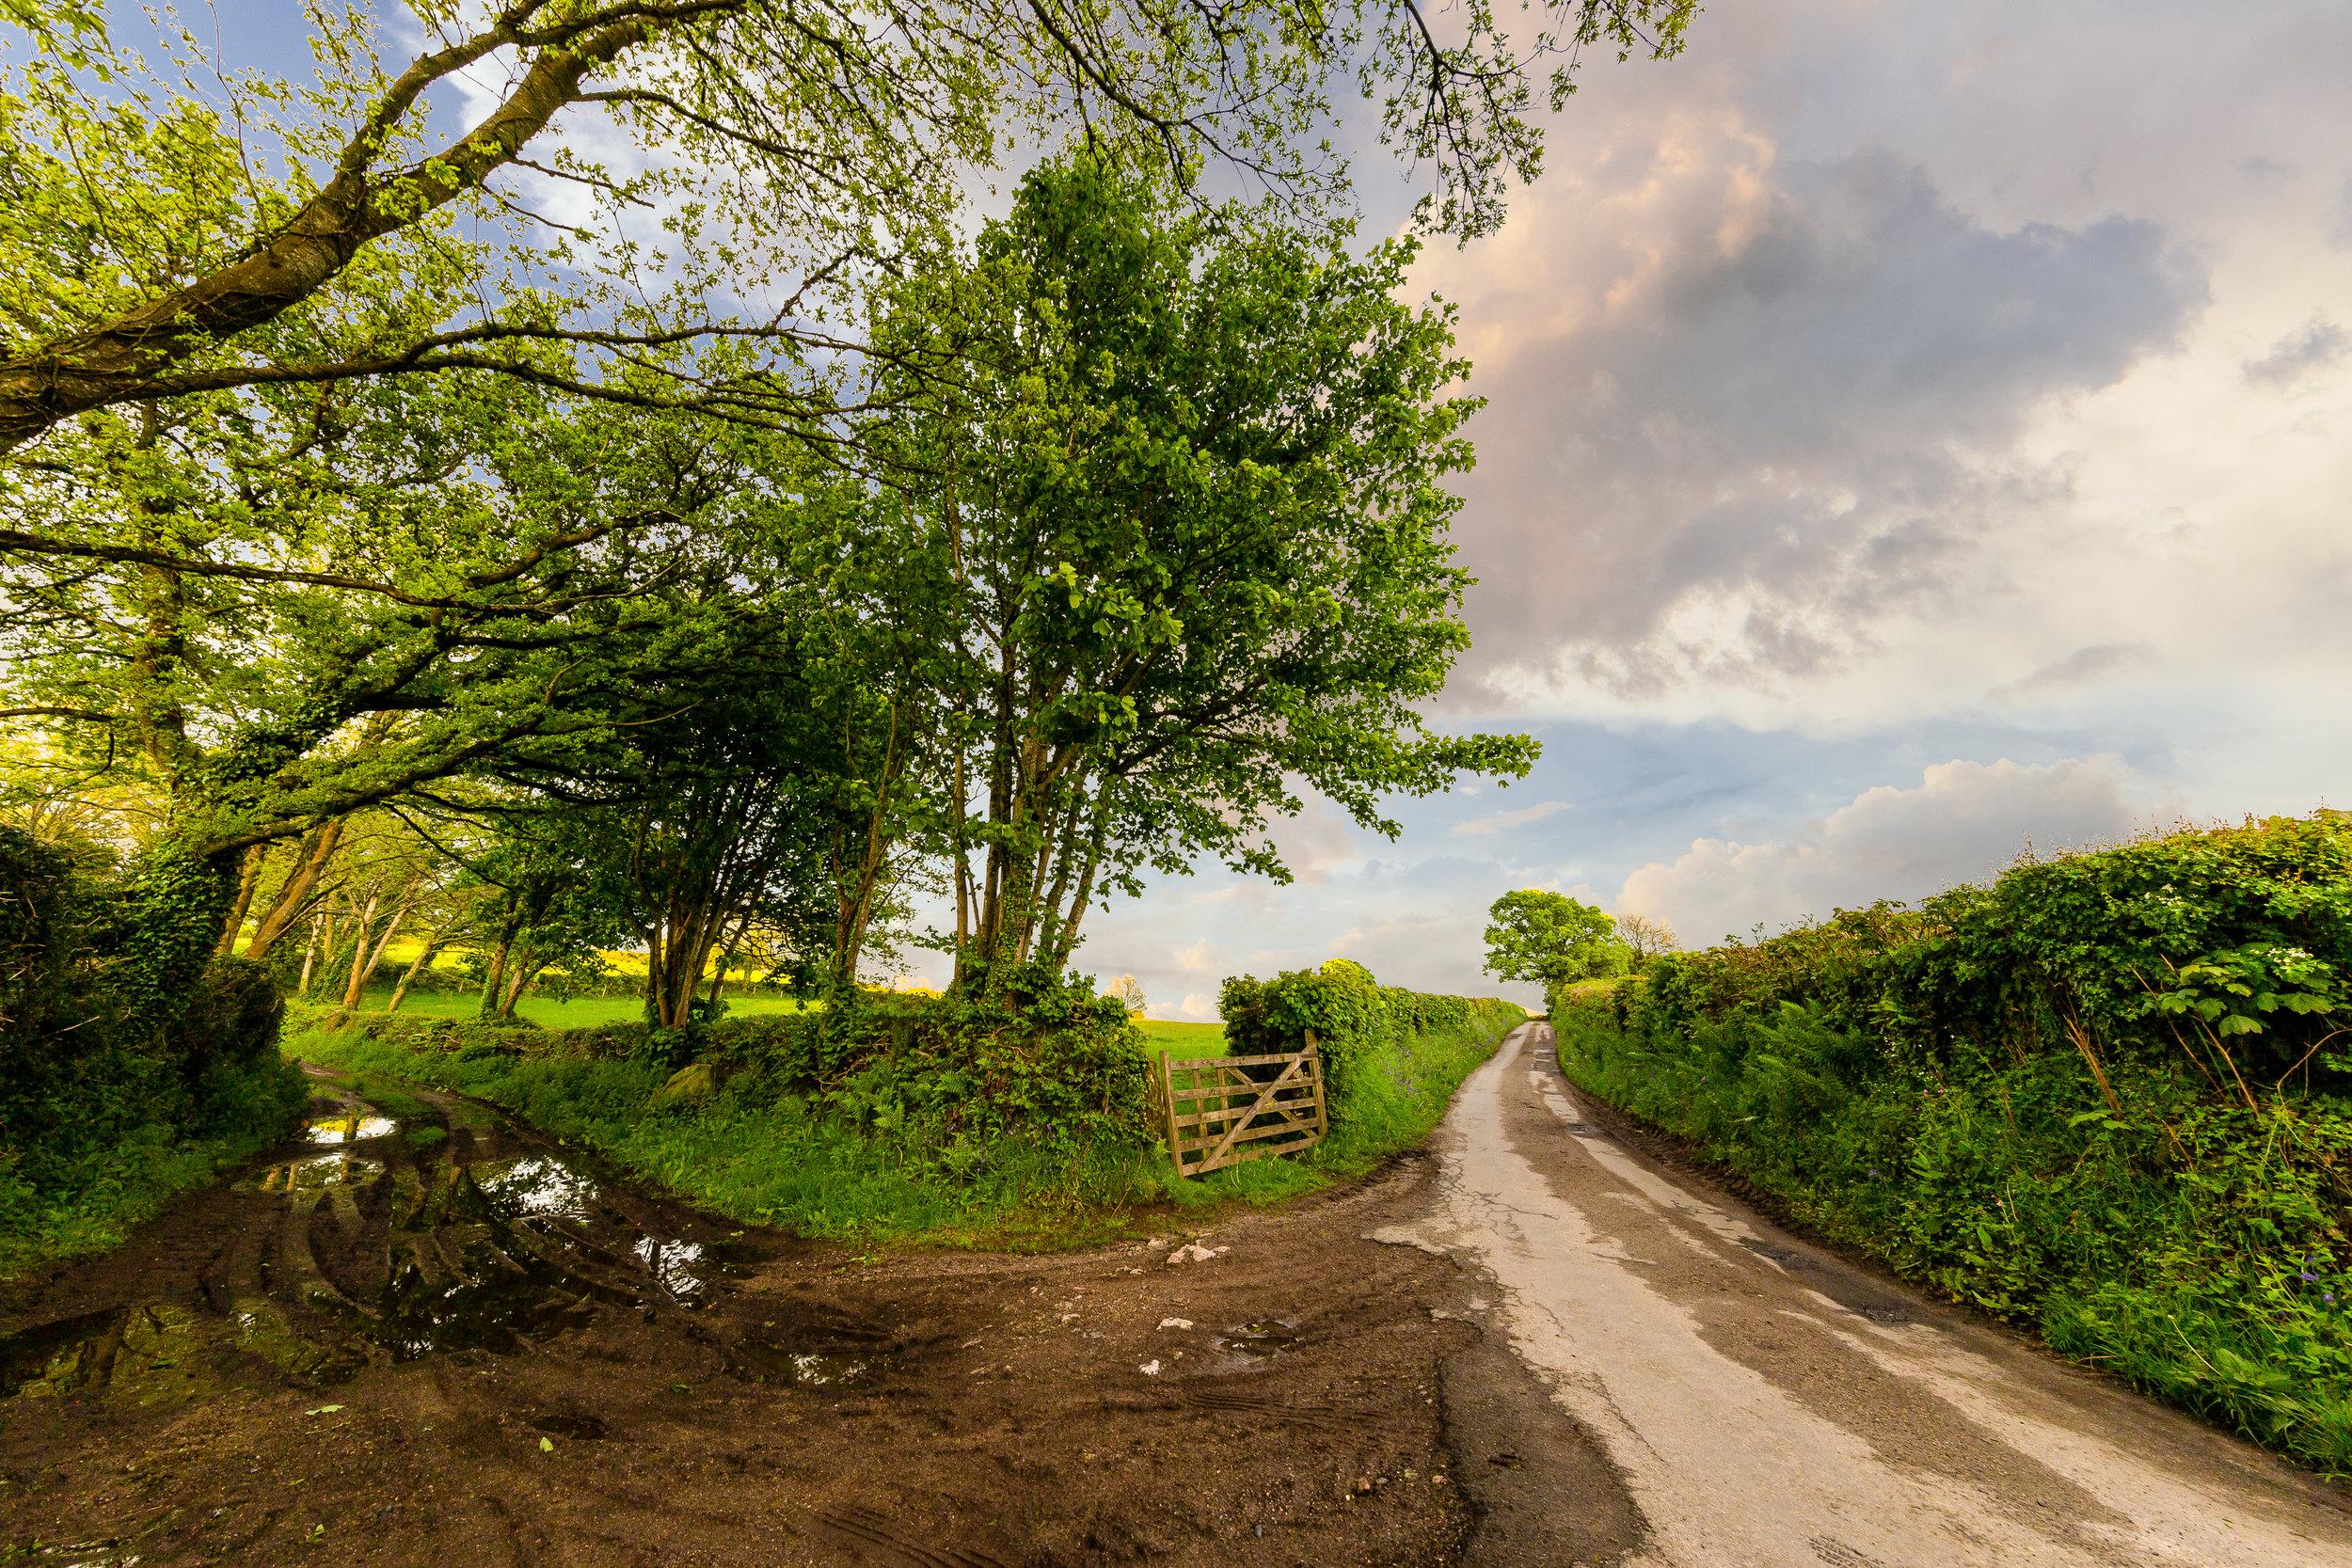 devon countryside dirt road